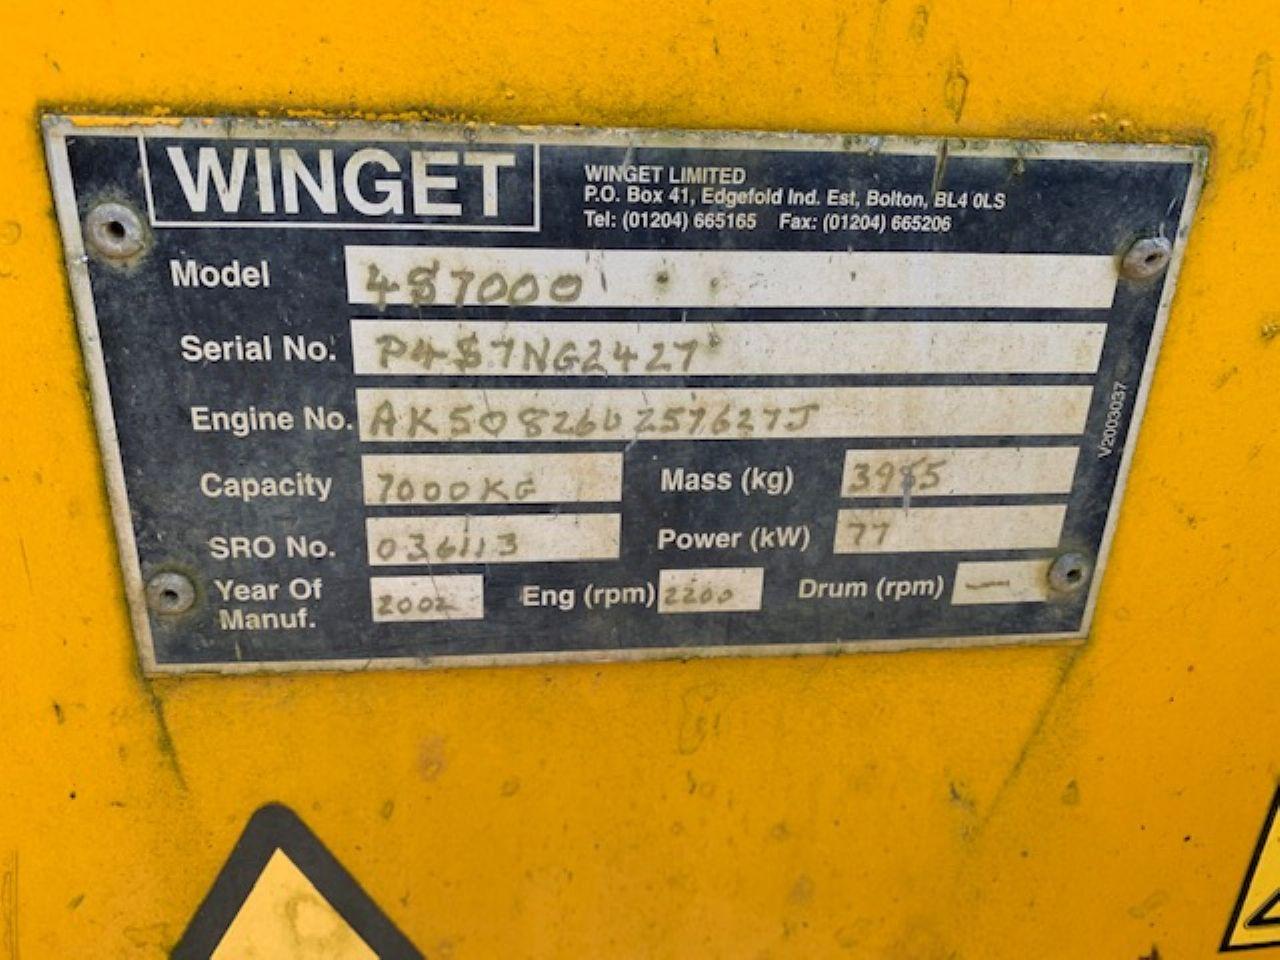 WINGET 4S7000 DUMPER - Picture 4